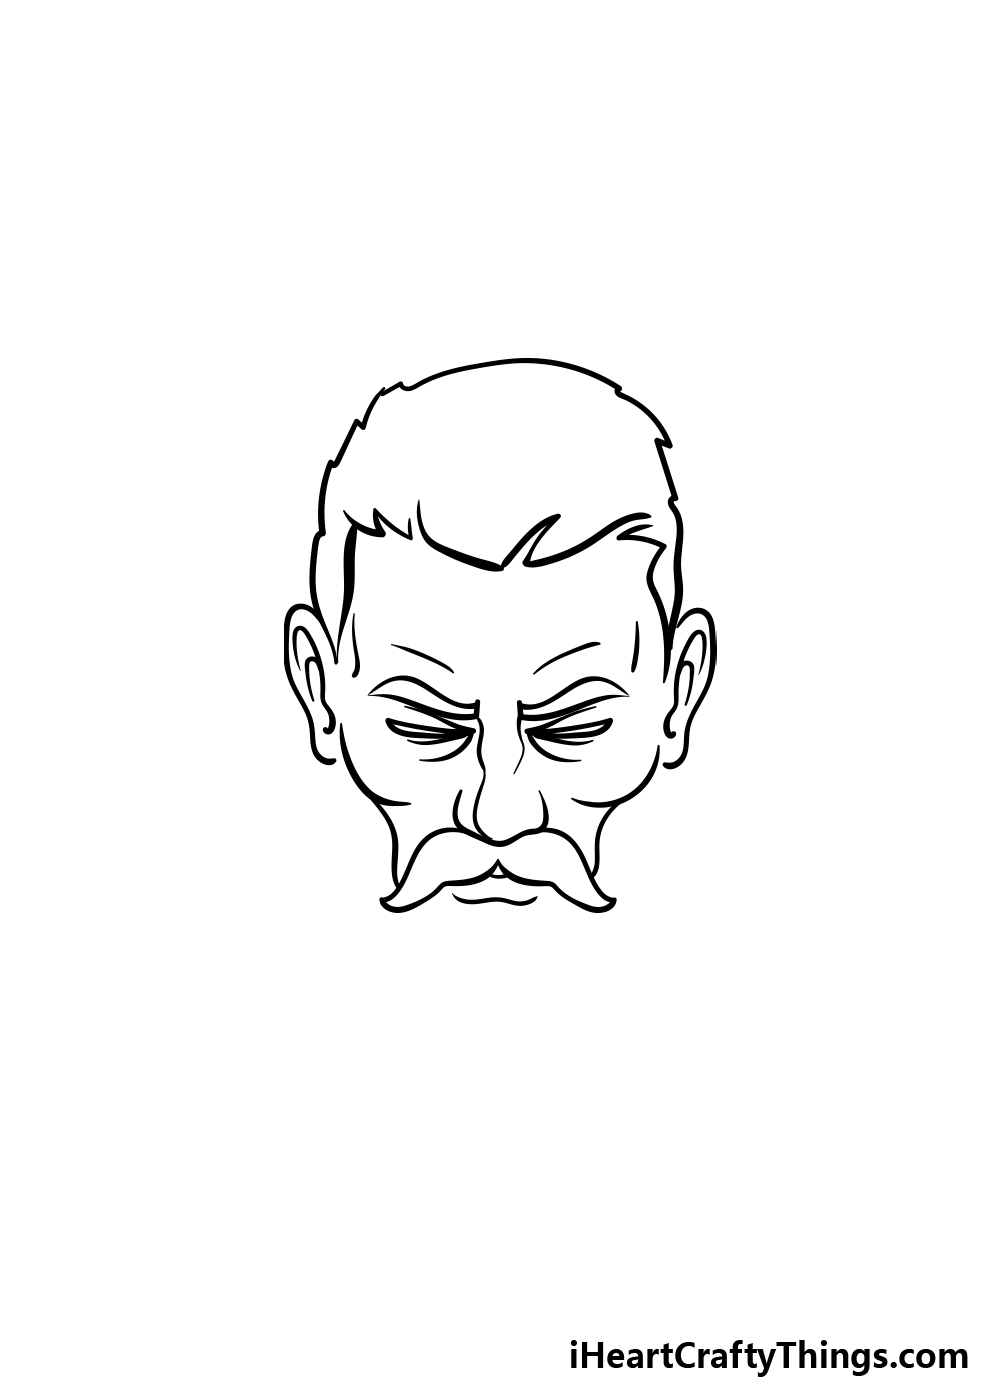 drawing a beard step 2